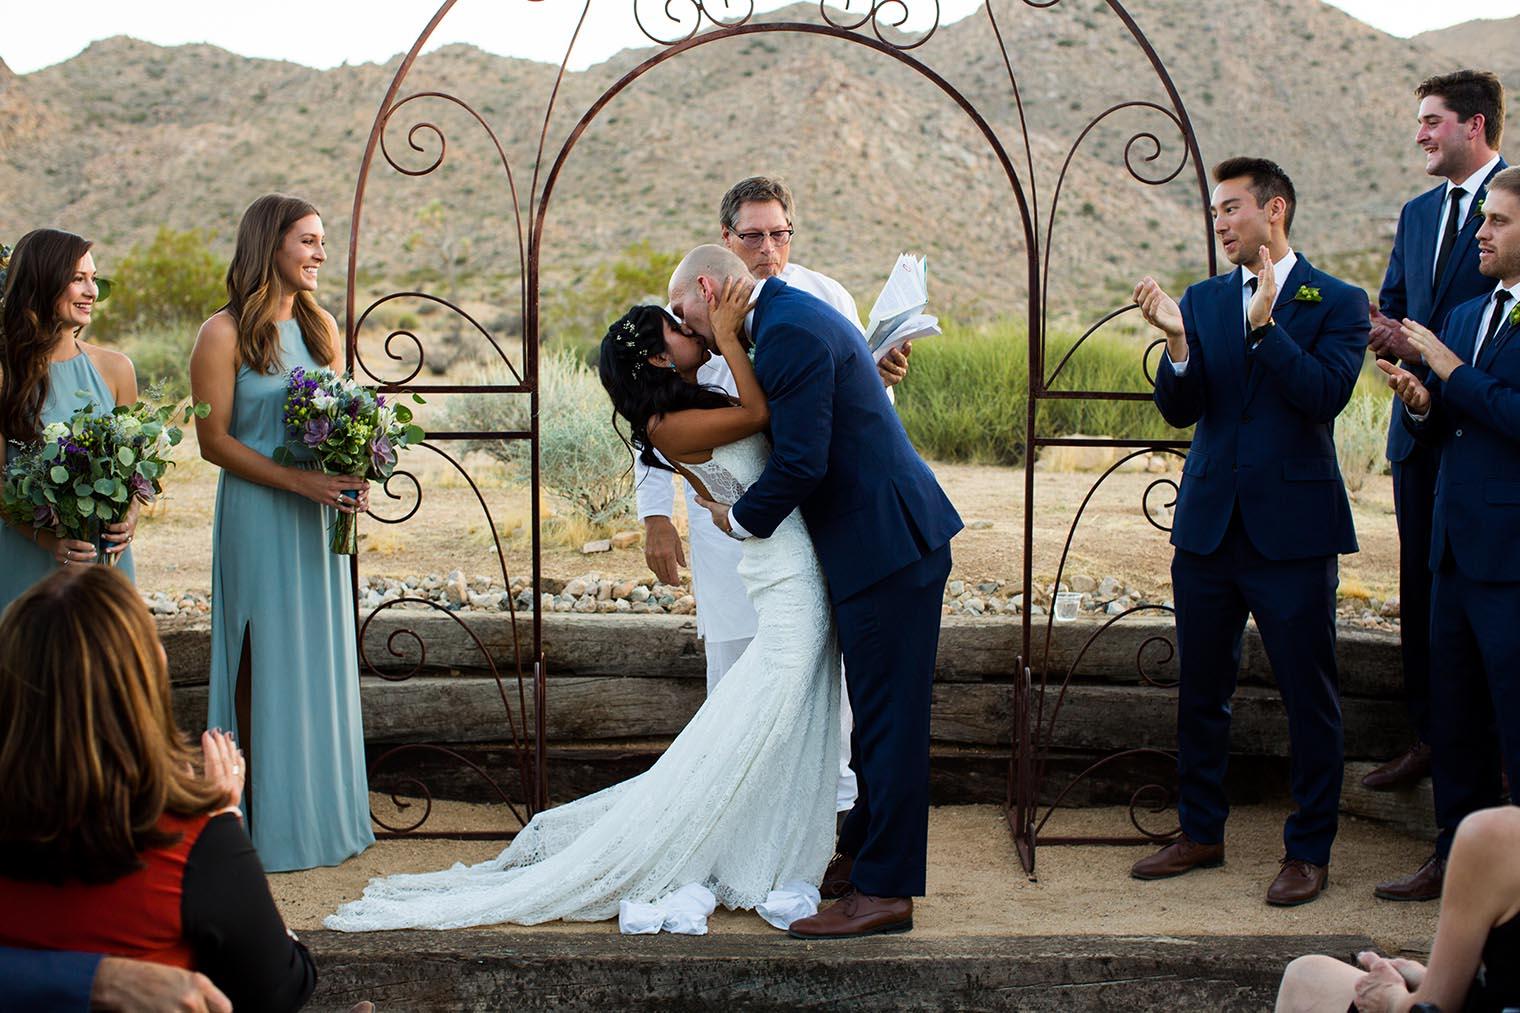 Sacred Sands Joshua Tree Wedding Ceremony 76 Dustin Cantrell